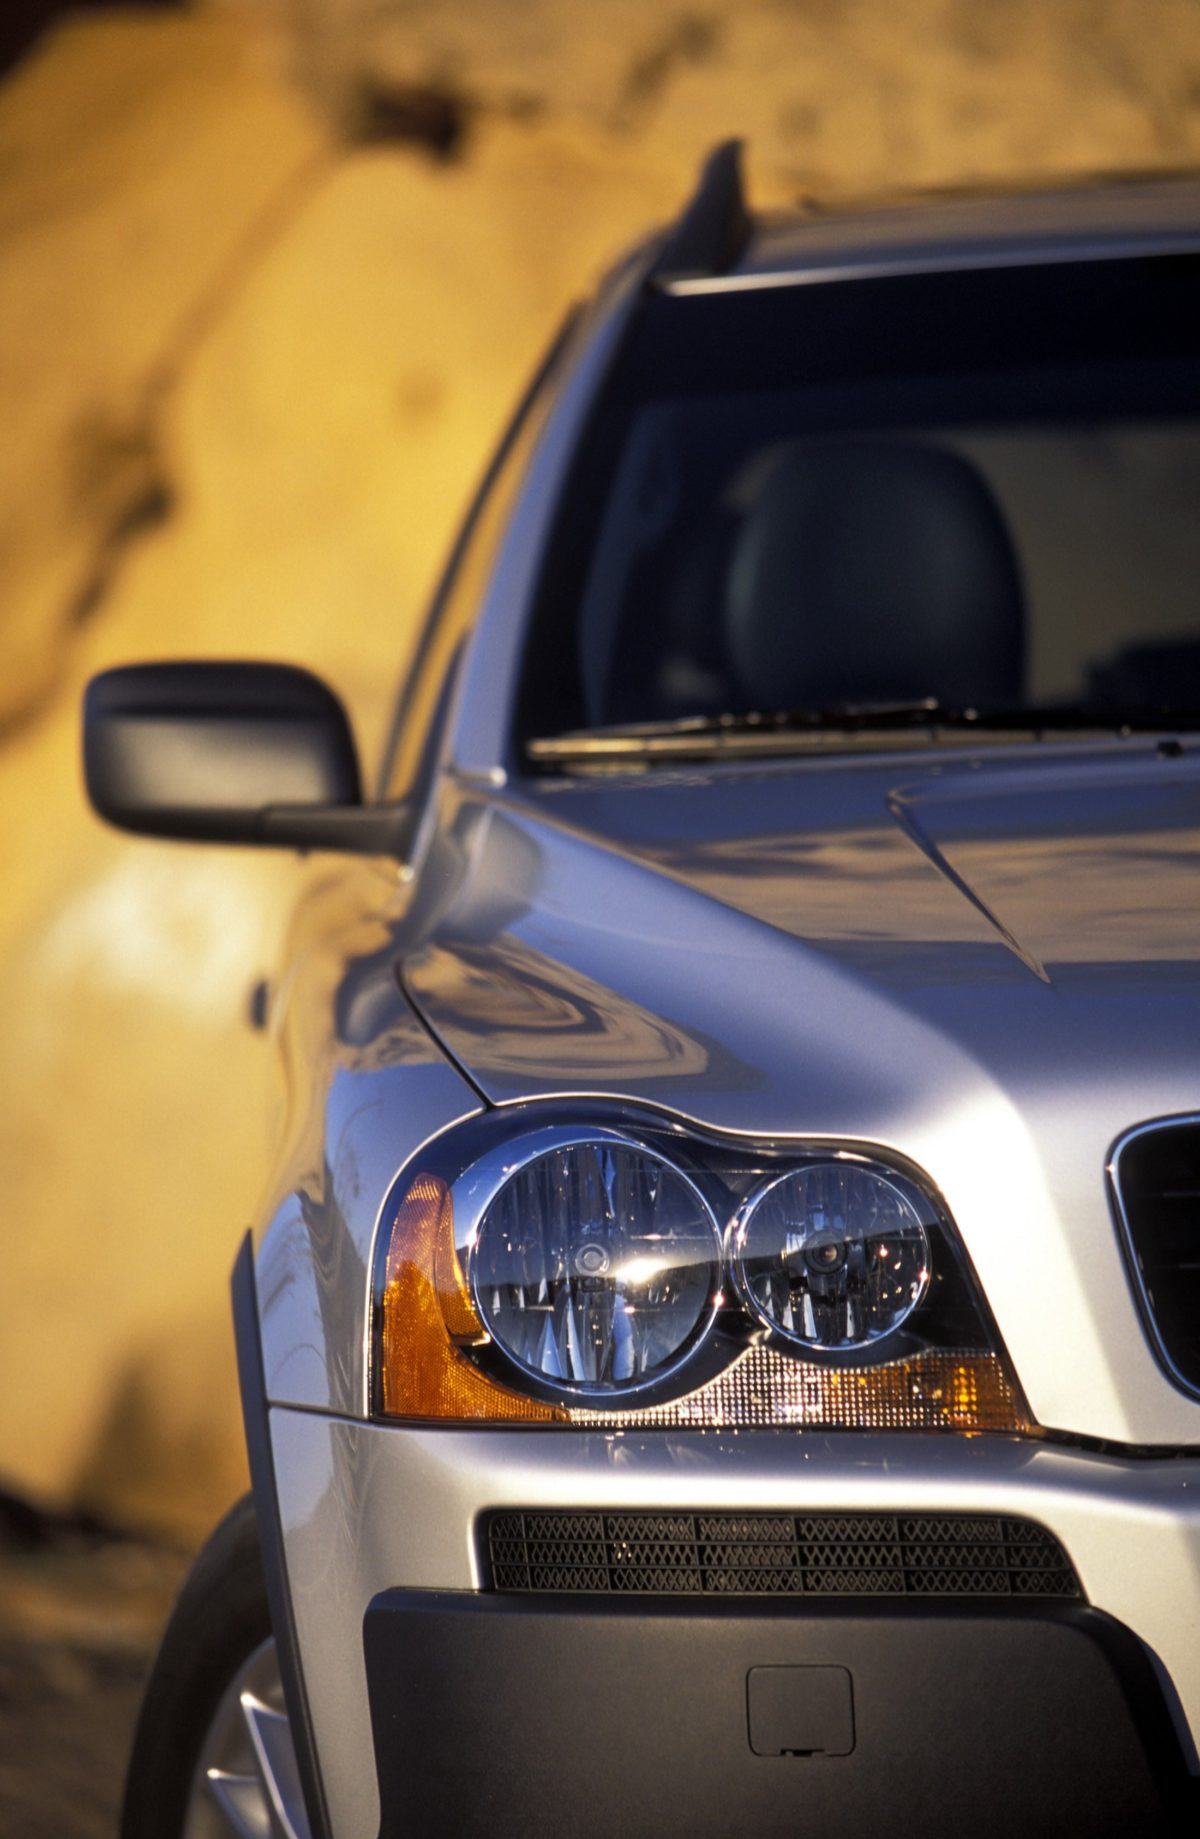 Volvo XC90 First Generation -  XC90